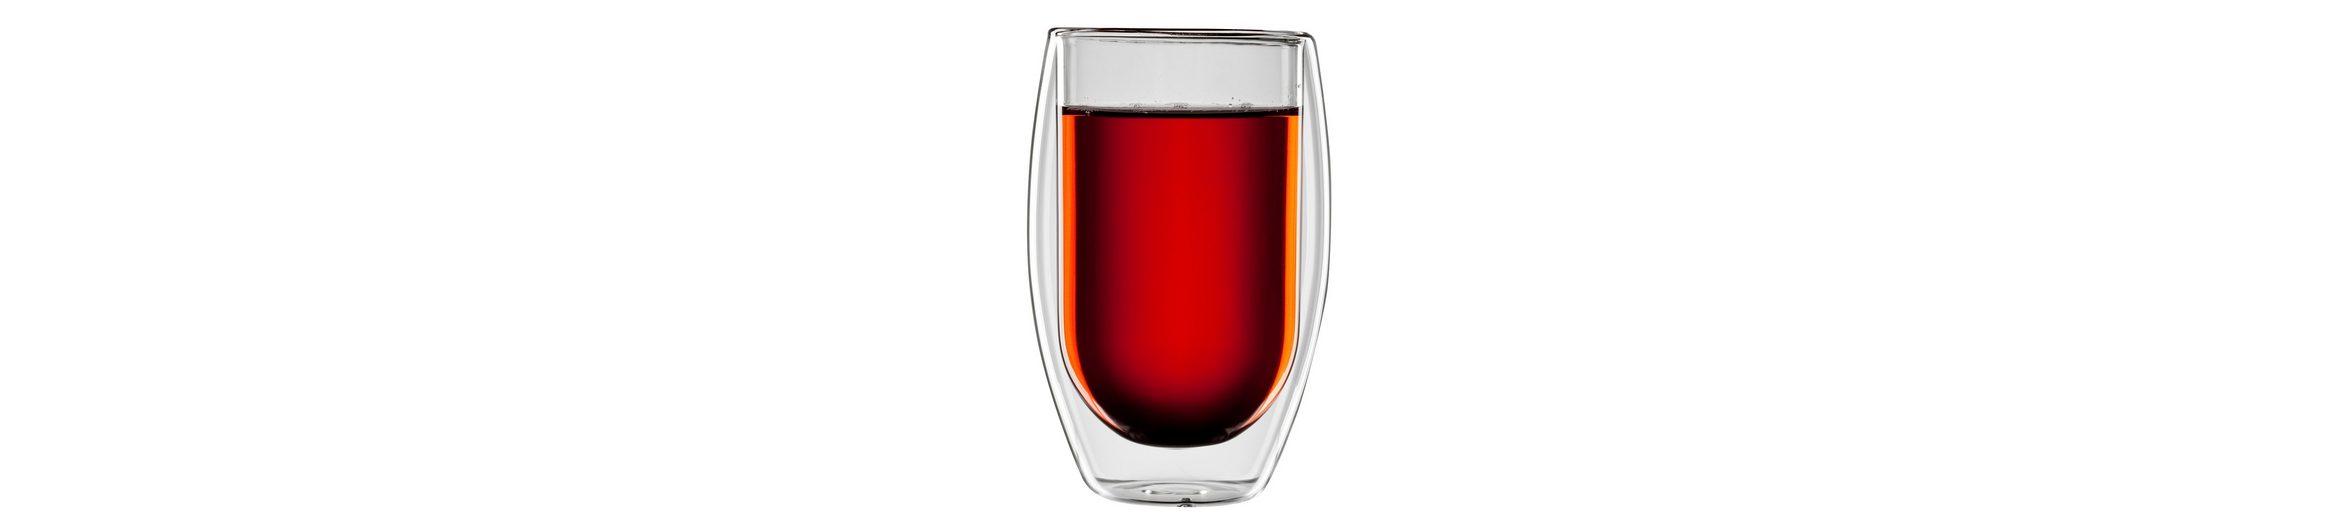 bloomix Teeglas, 4er Set, »Tetouan«, 400 ml